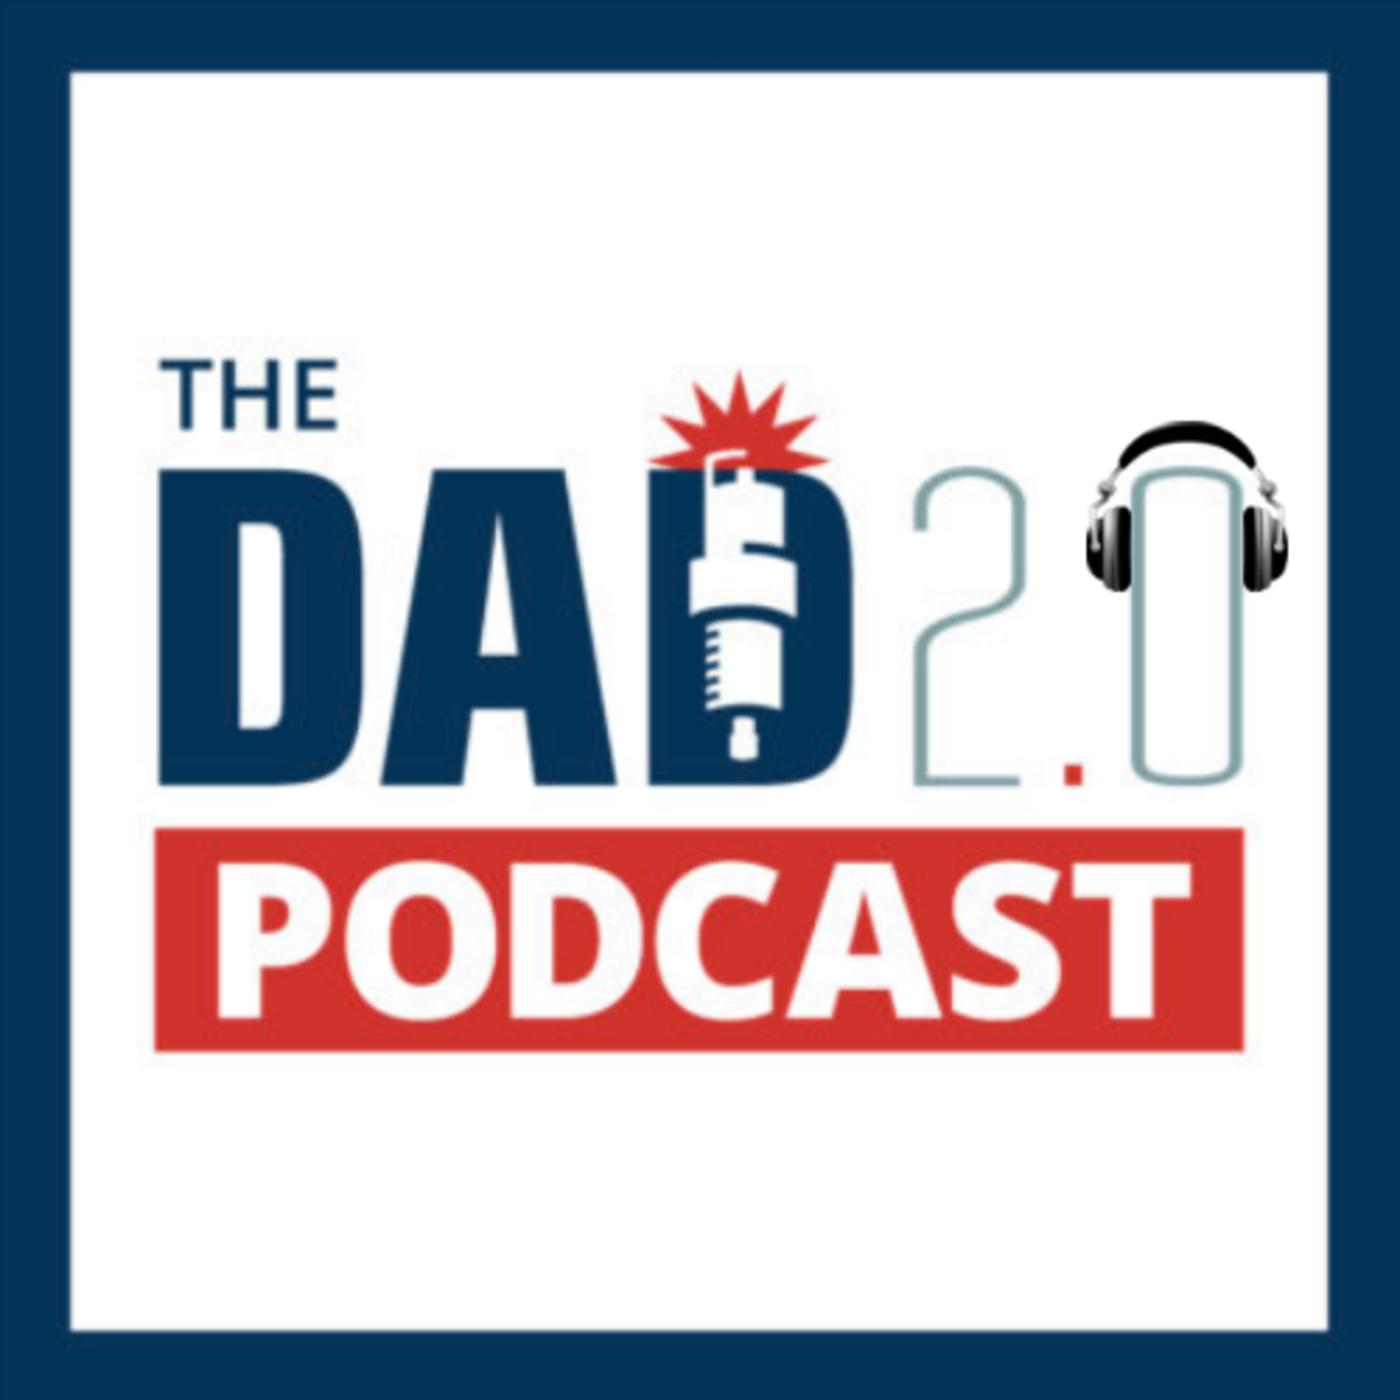 Dad 2.0 Podcast show art